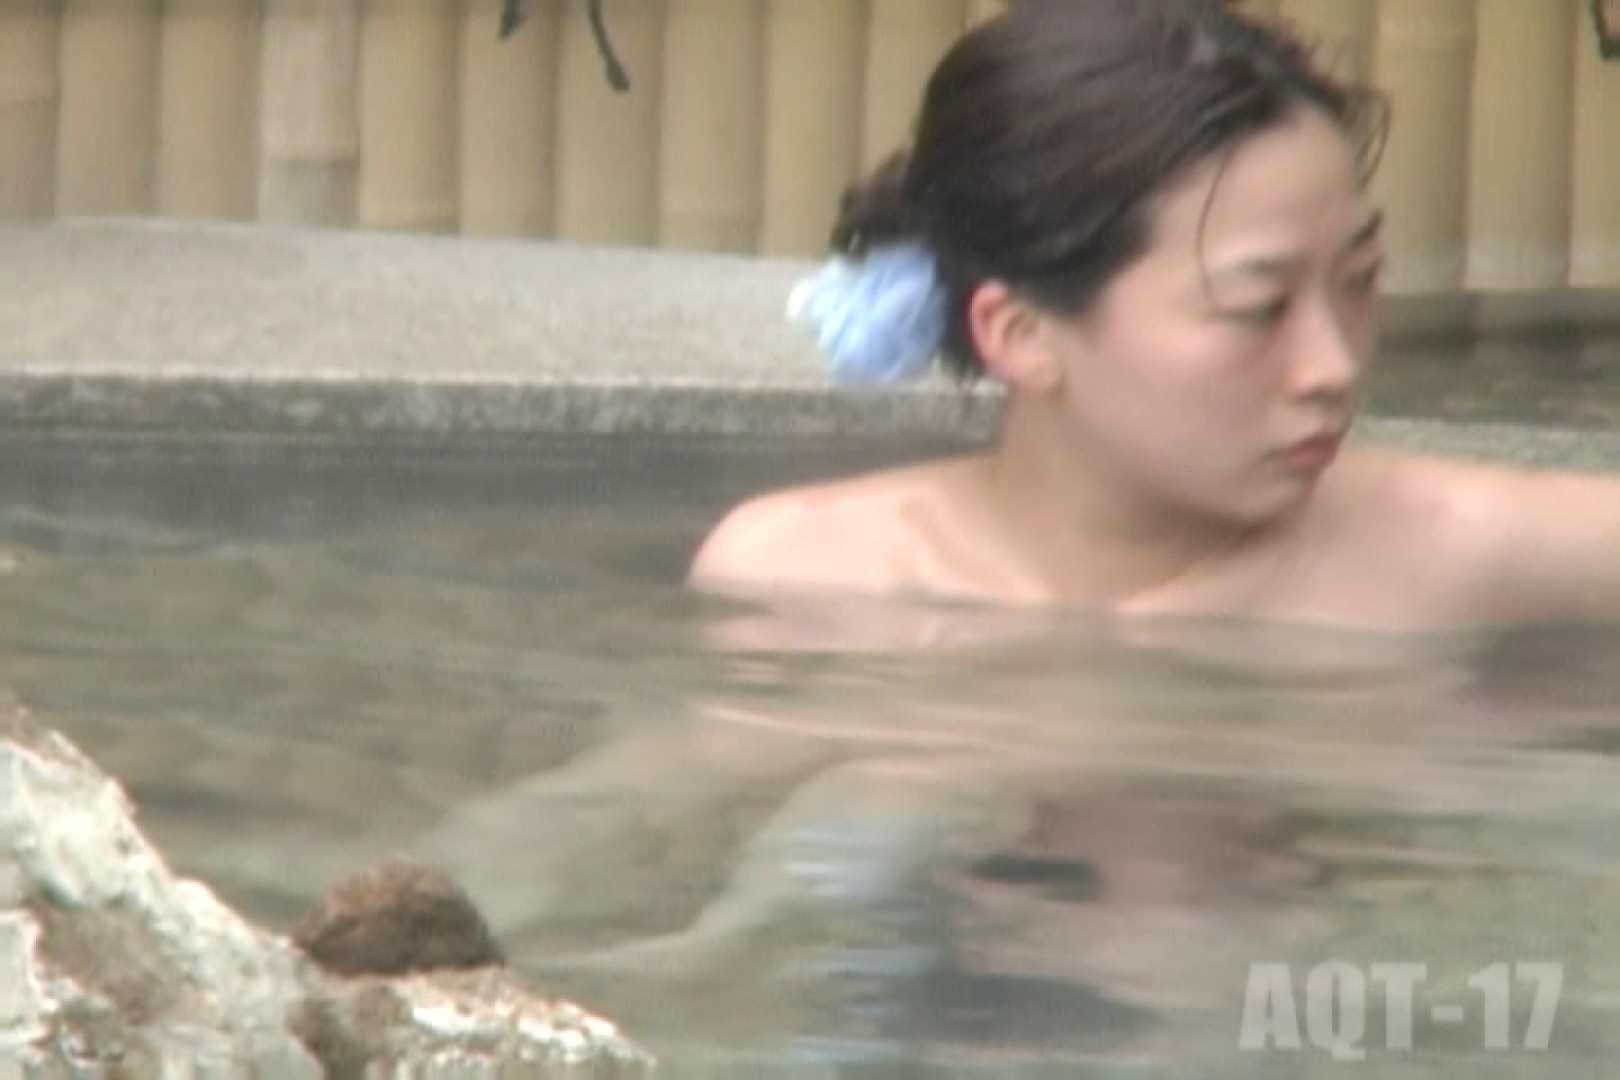 Aquaな露天風呂Vol.848 盗撮特撮 | OLのプライベート  12pic 7